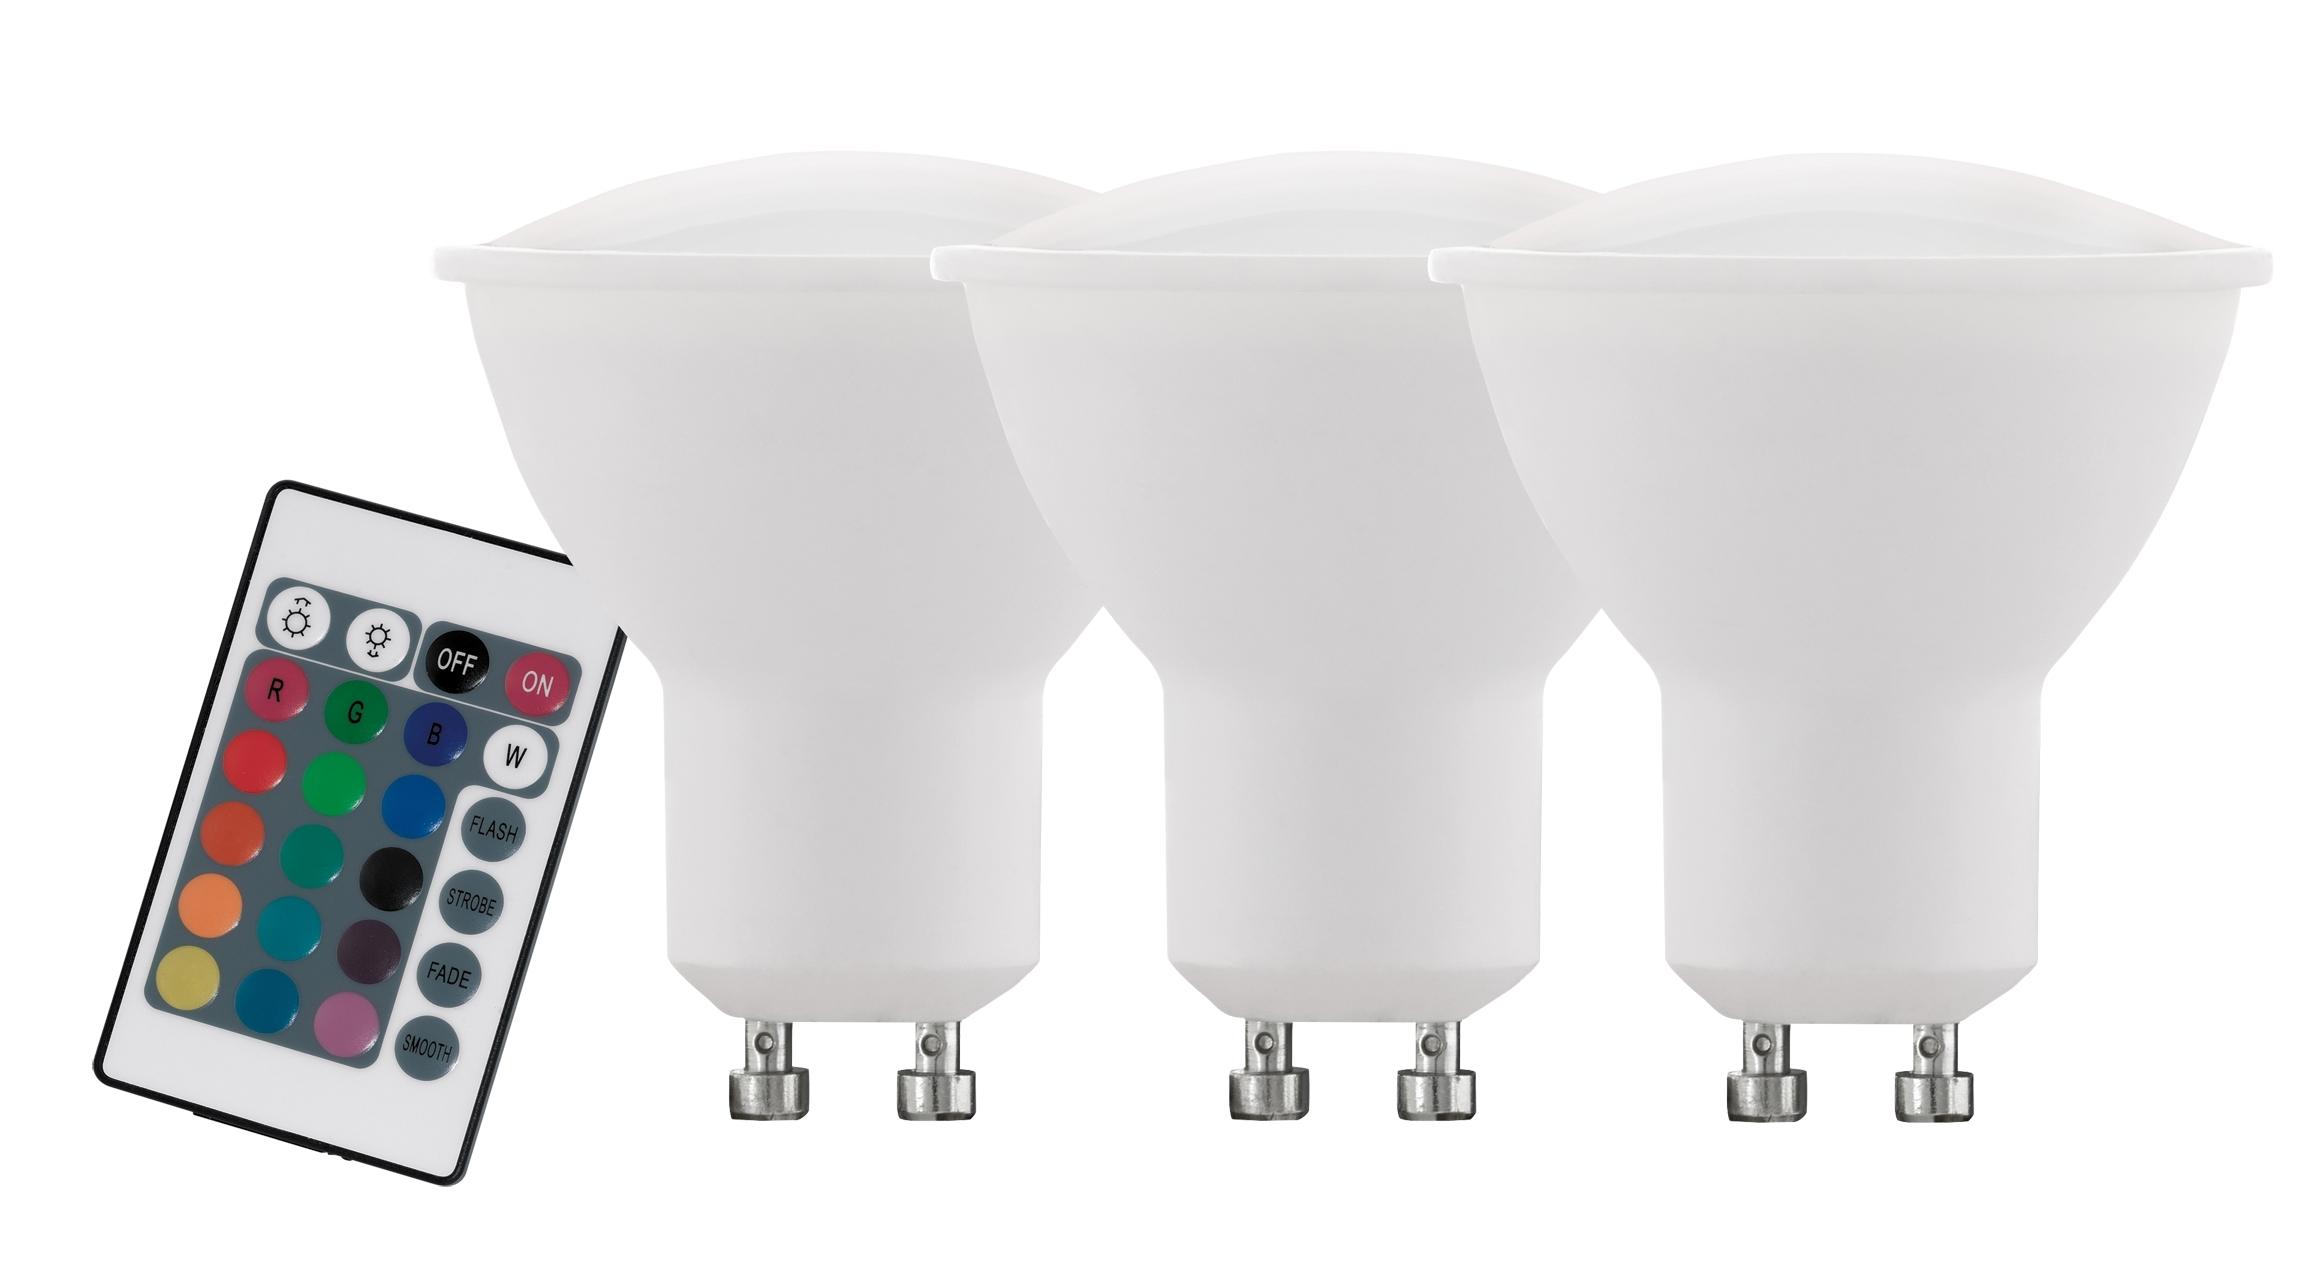 Set 3 becuri cu telecomanda Eglo LED LM-GU10 RGBW 4W poza